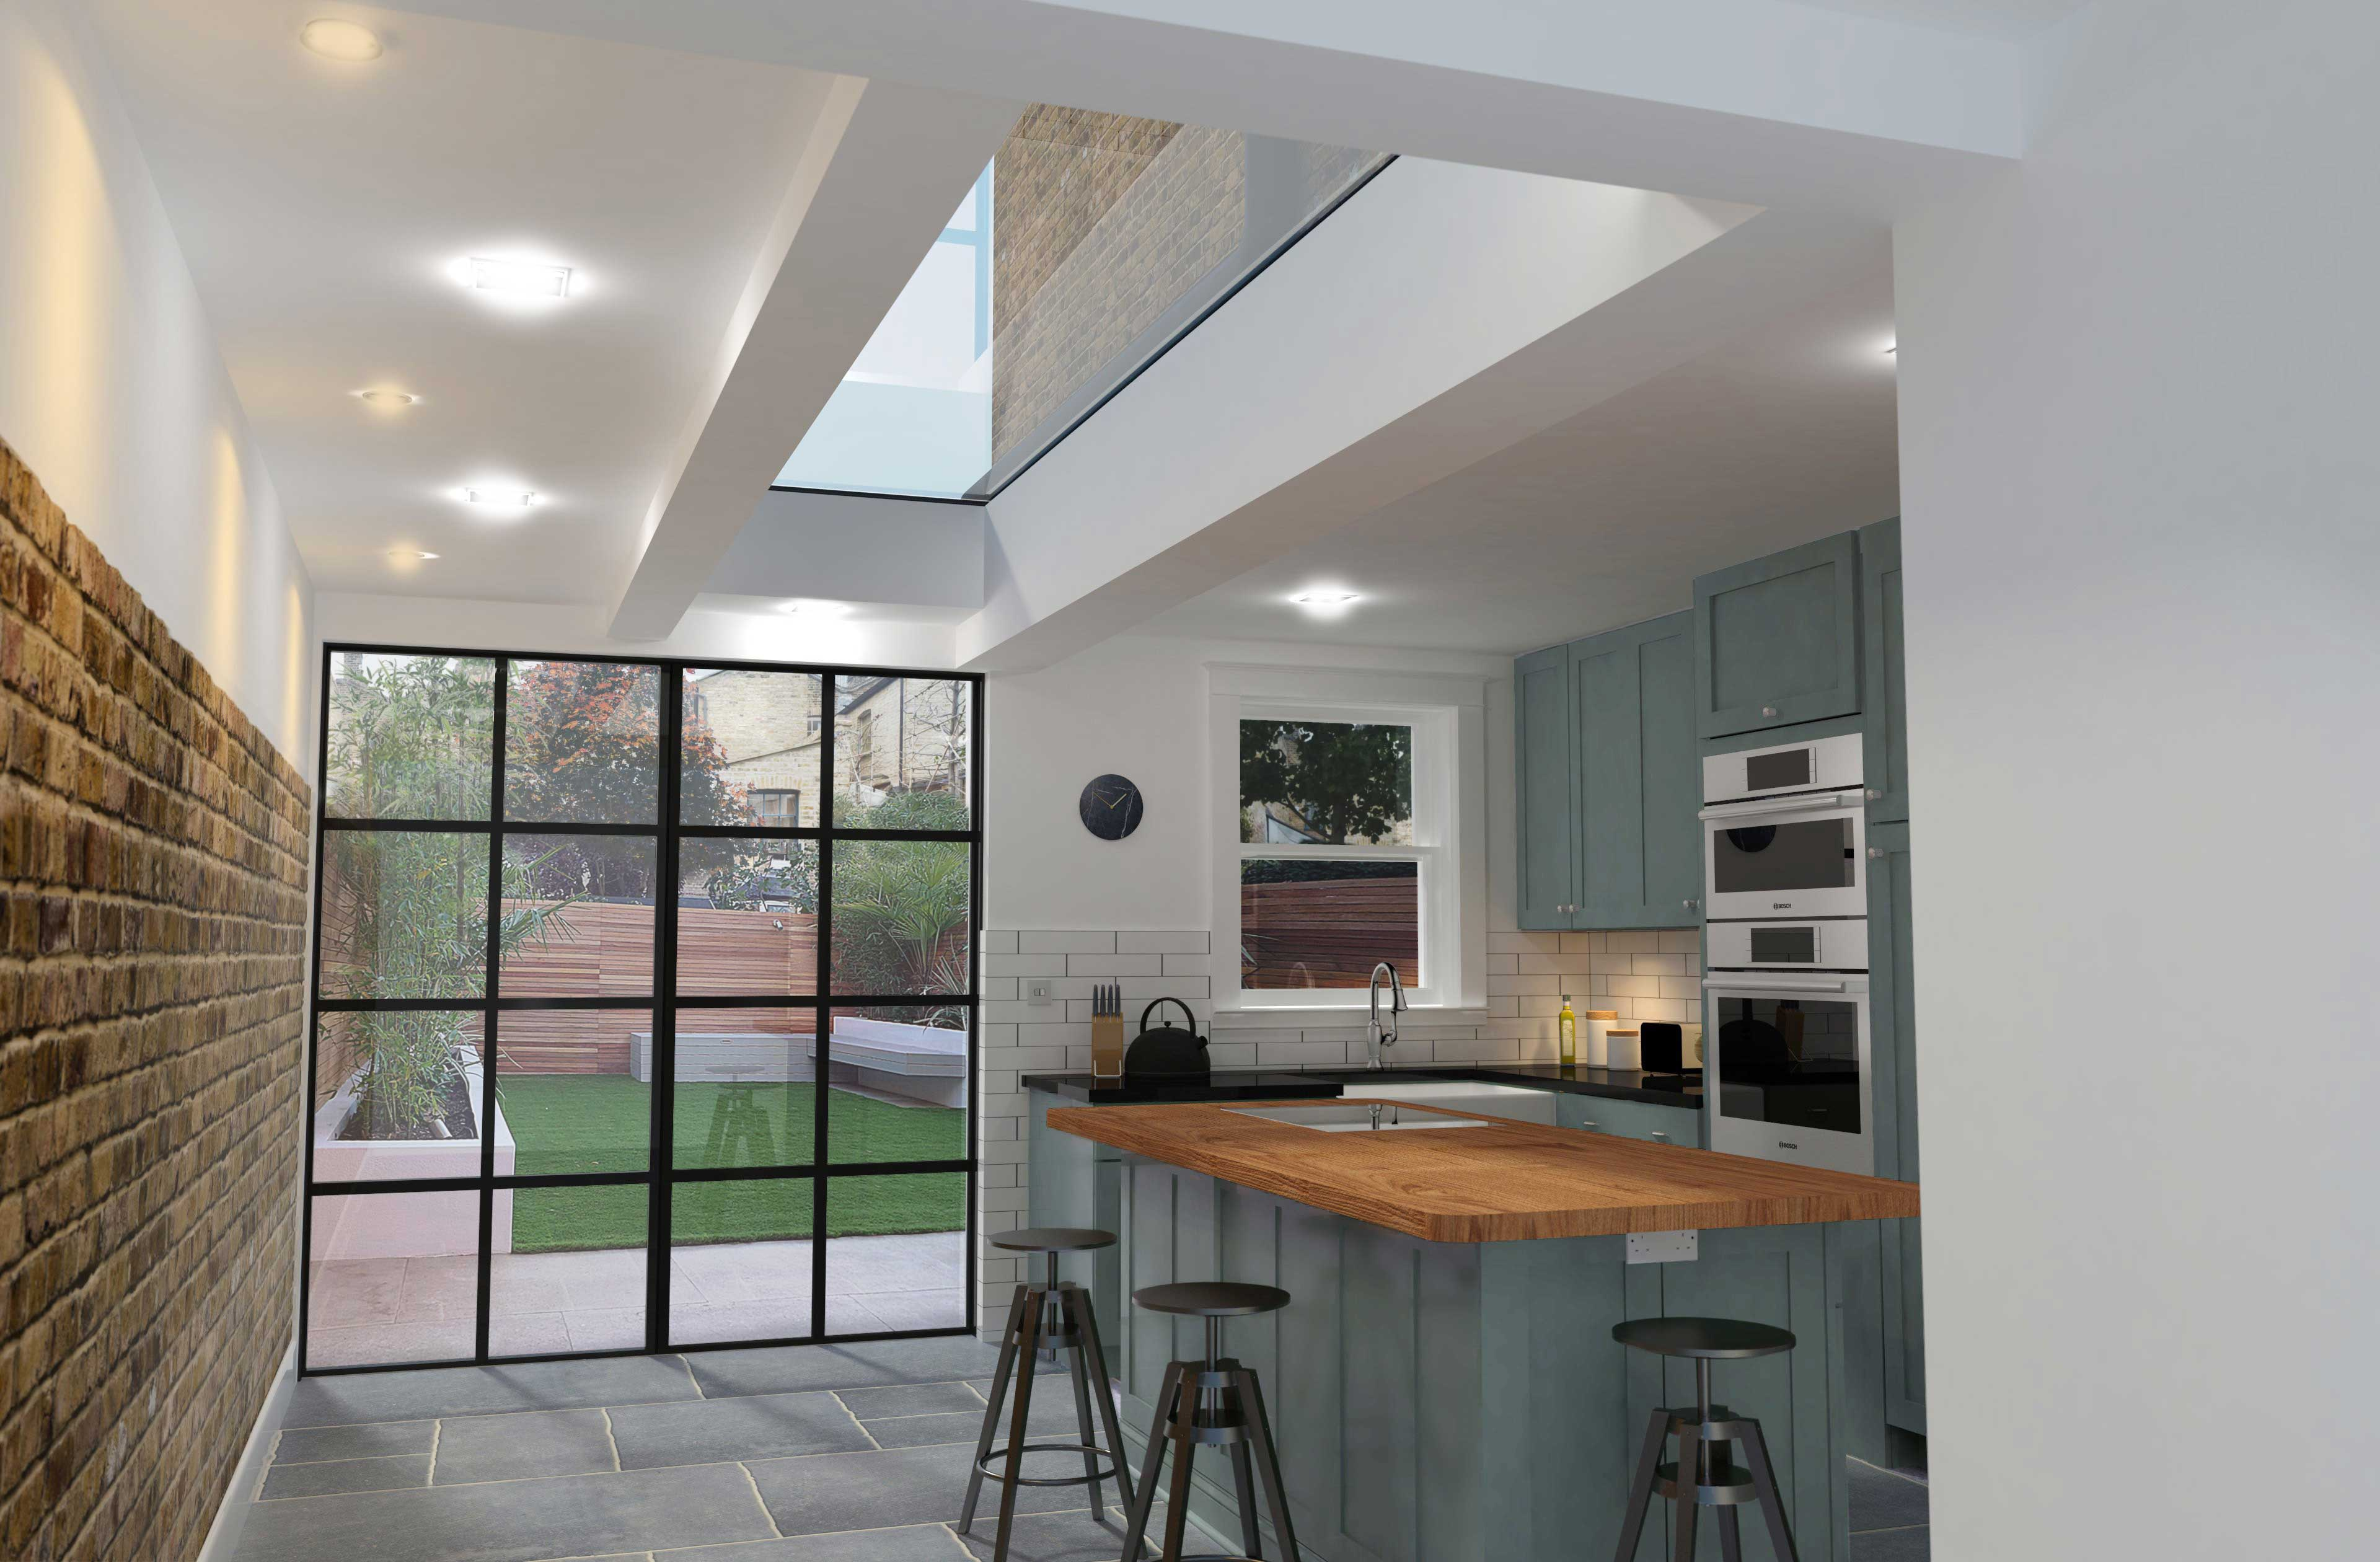 High Performance Flat Rooflights